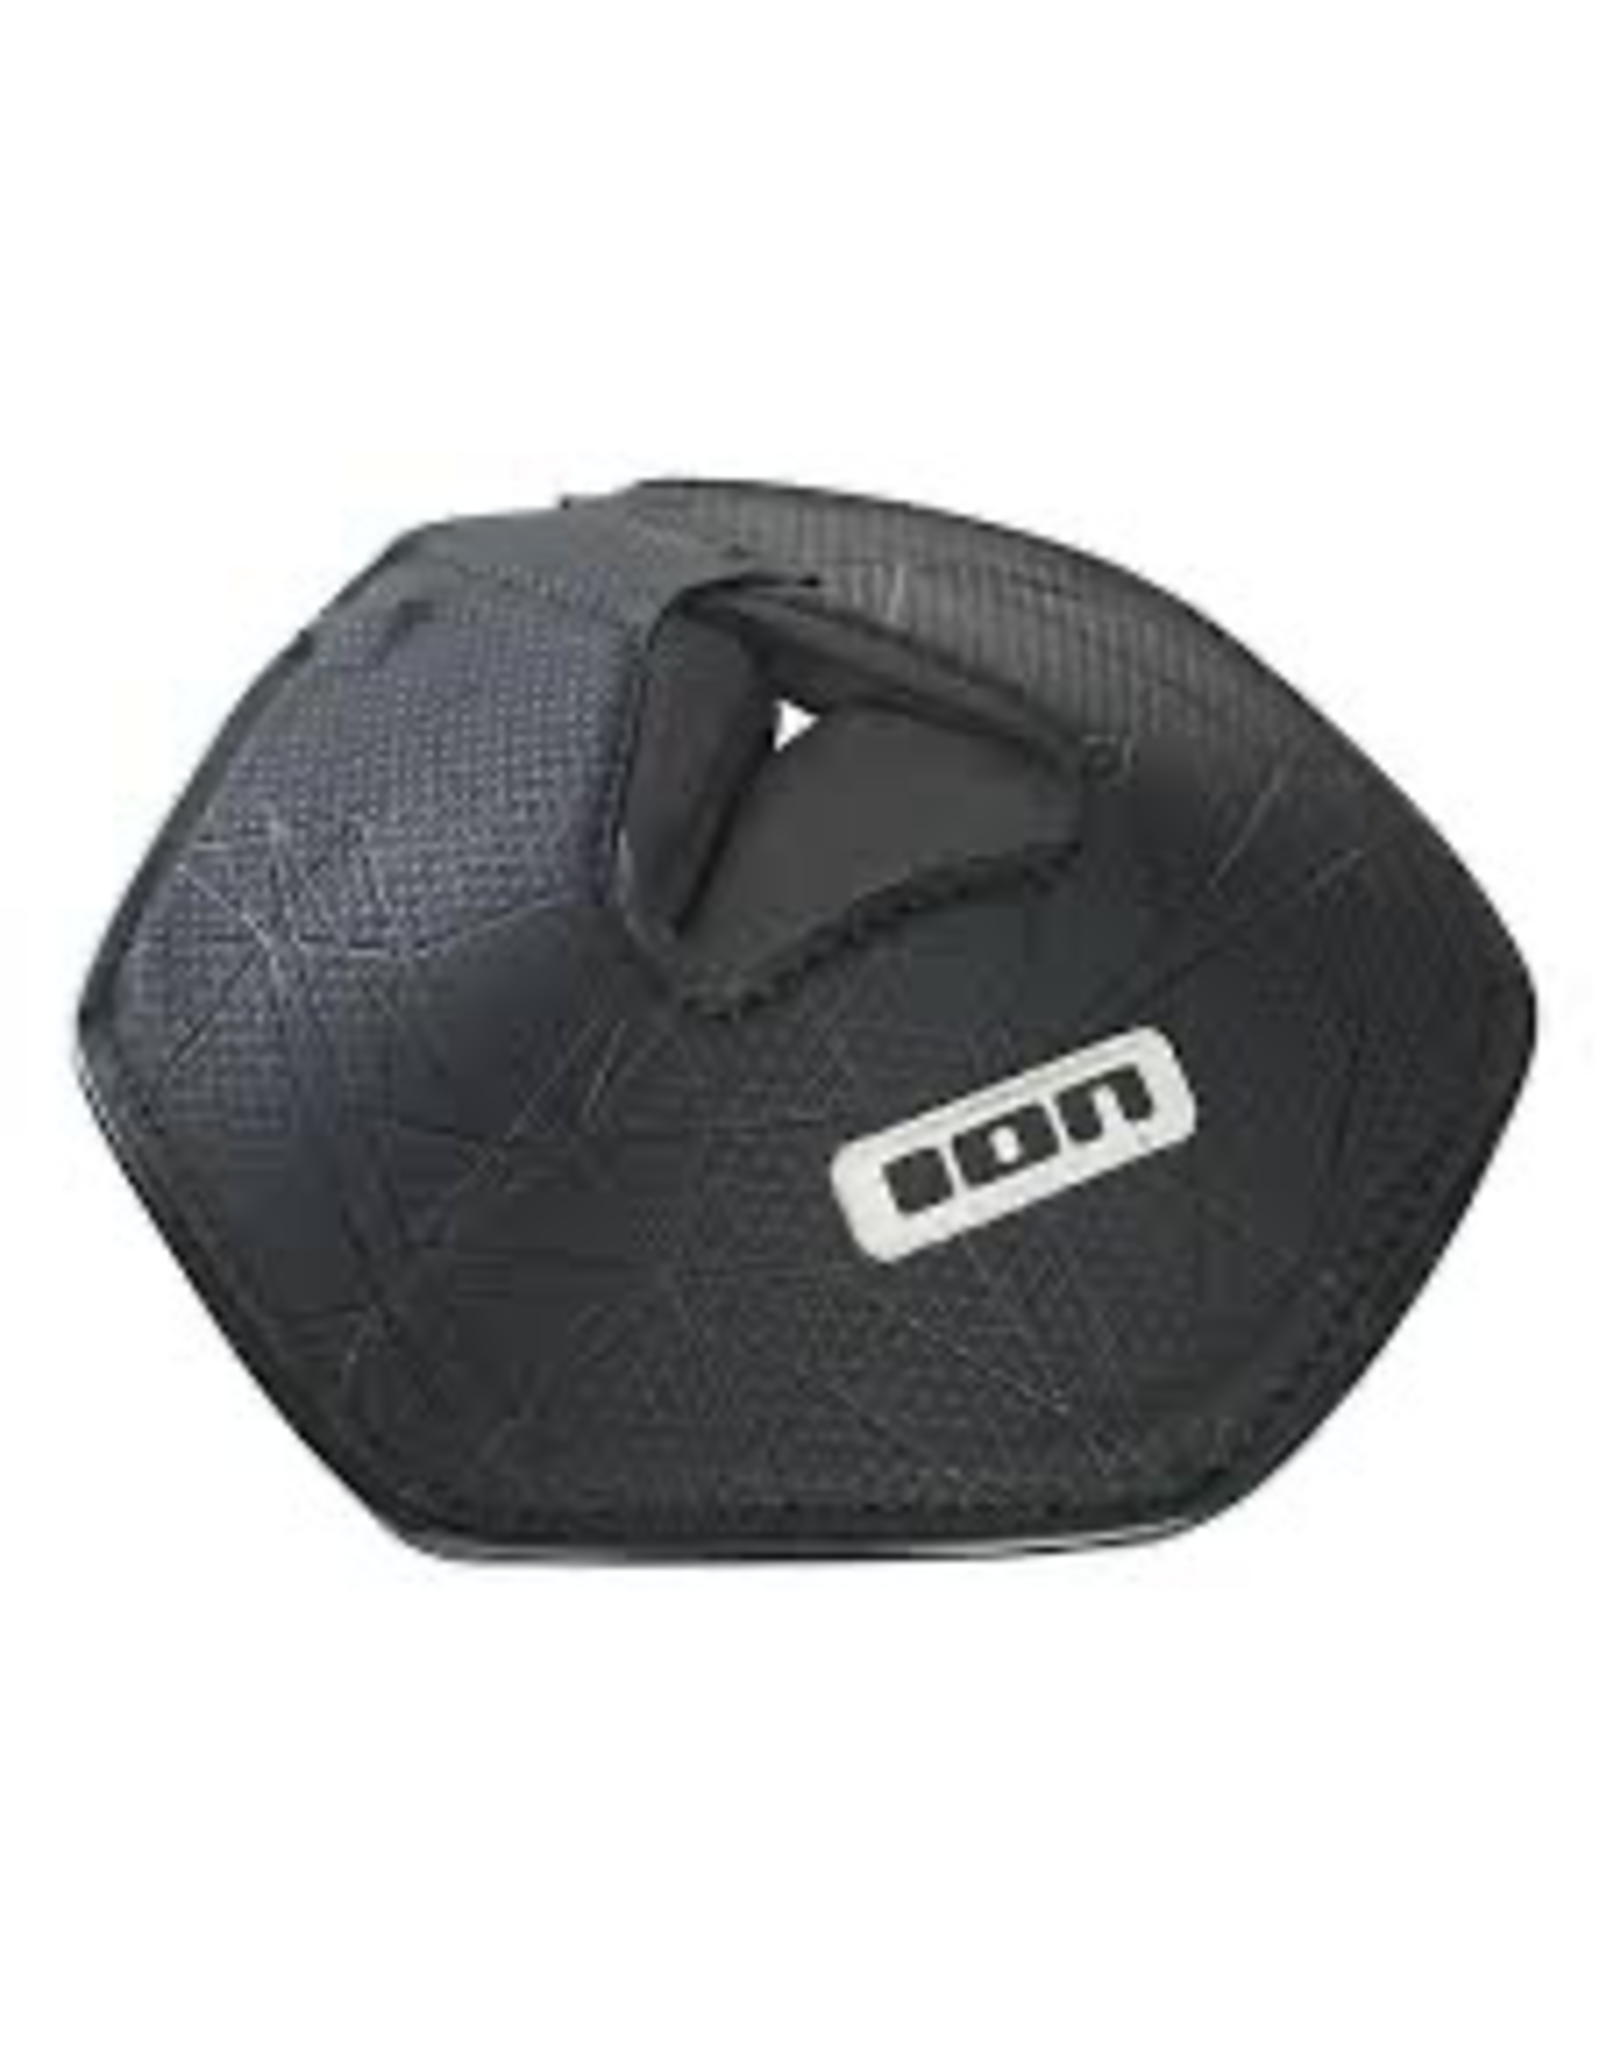 Duotone Duotone - Mastbase Protector - One Size